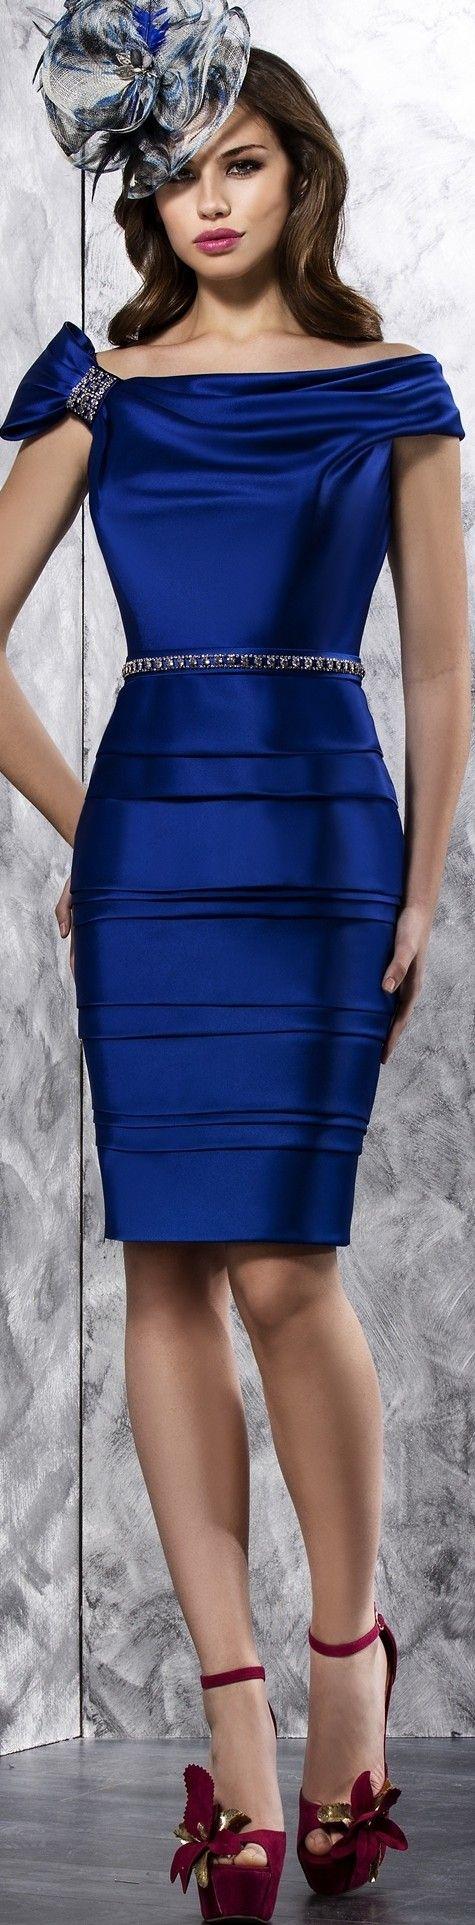 Valerio Luna women fashion outfit clothing style apparel @roressclothes closet ideas